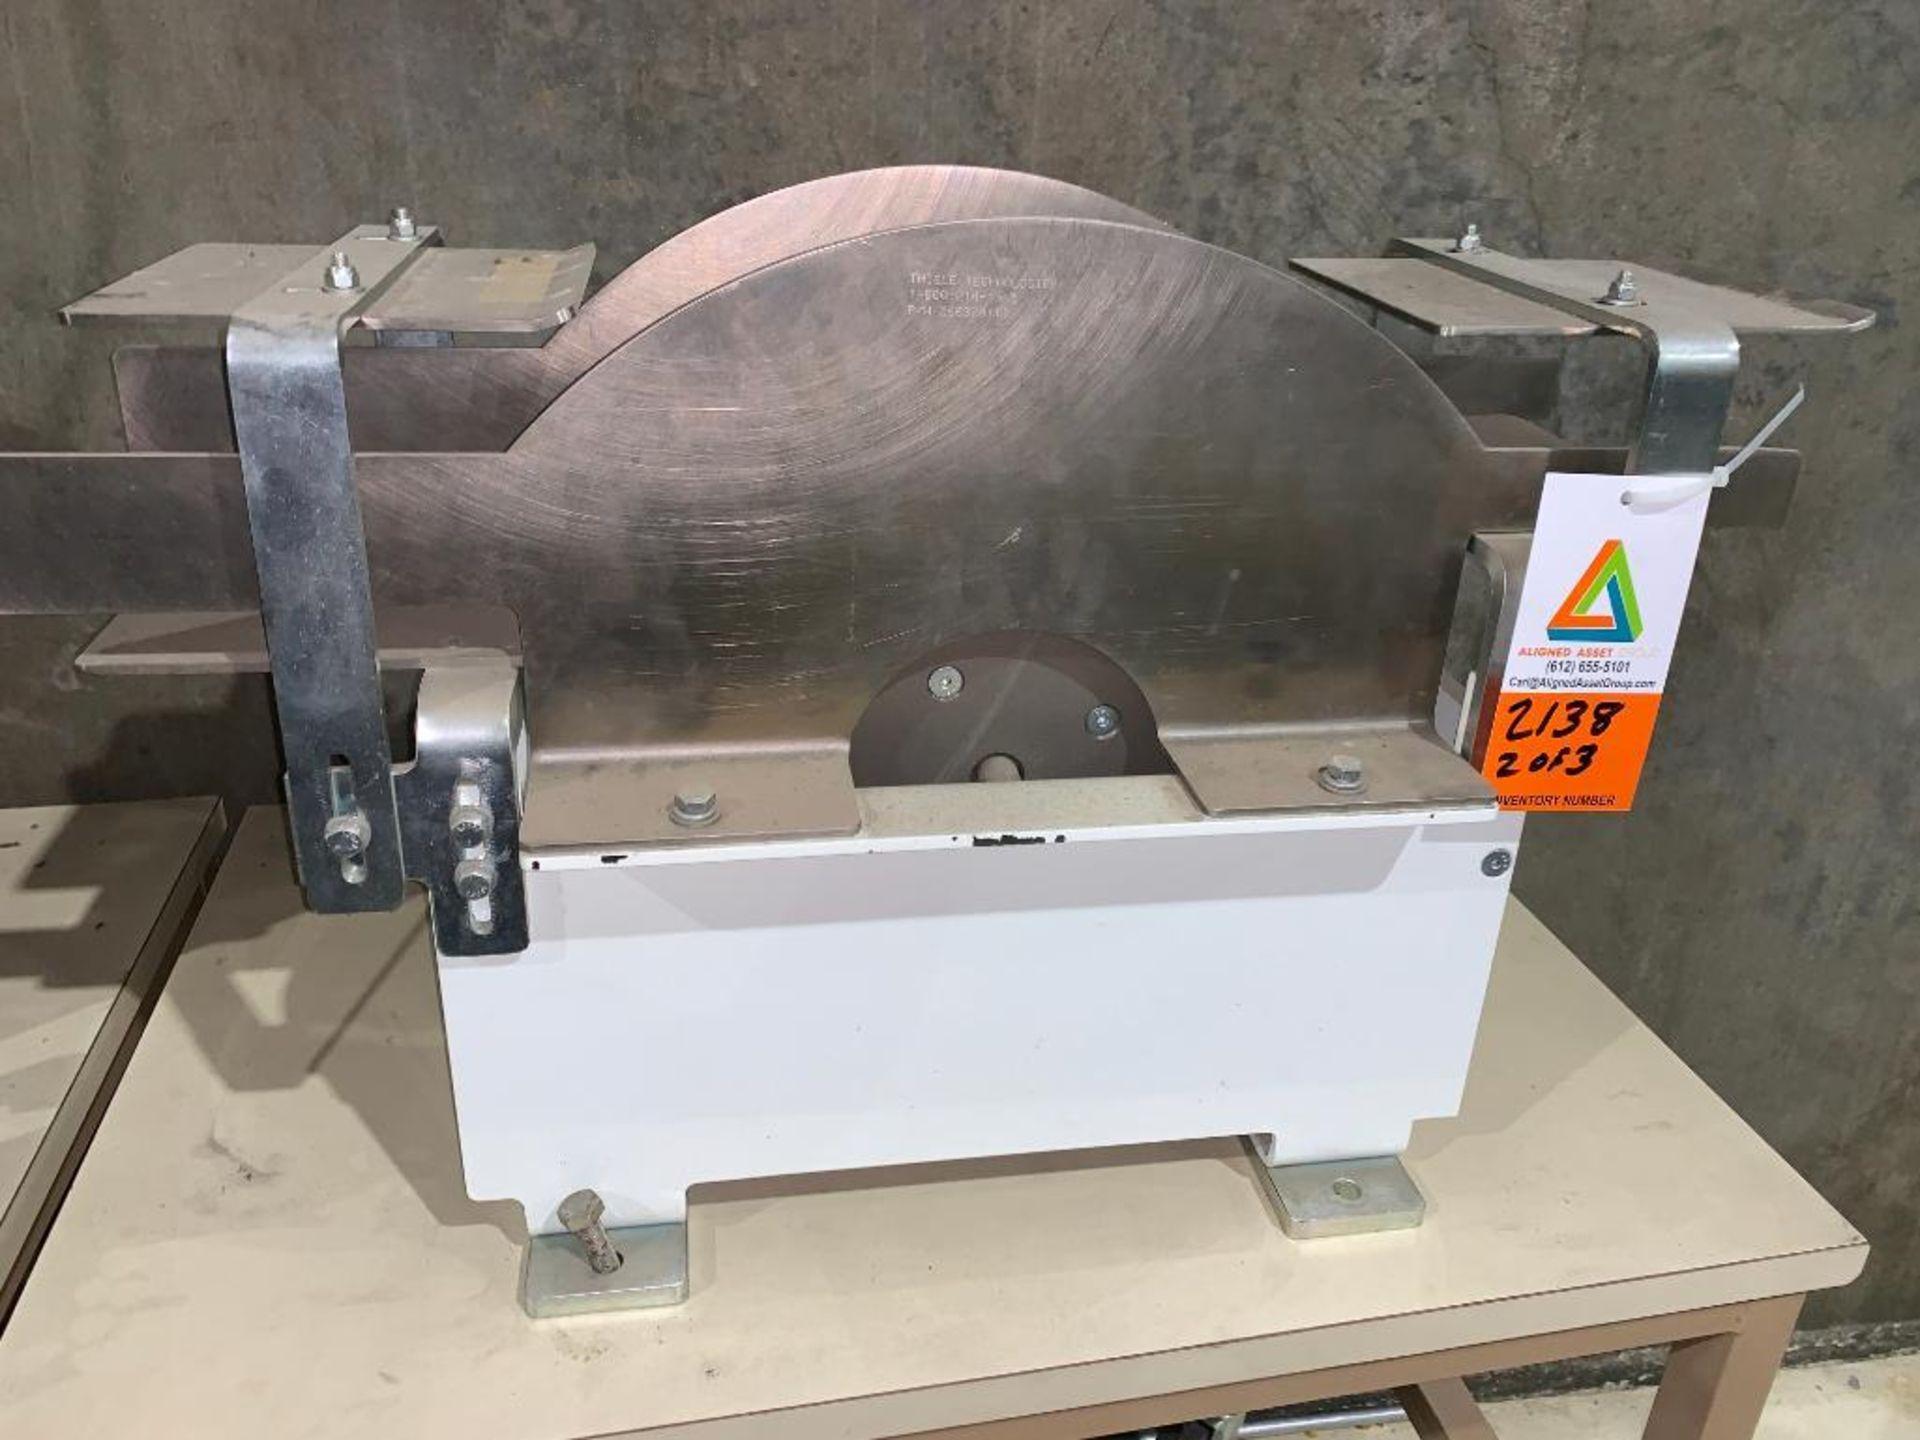 mild steel belt conveyor, 68 in. x 10 in., with box conditioner - Image 10 of 13